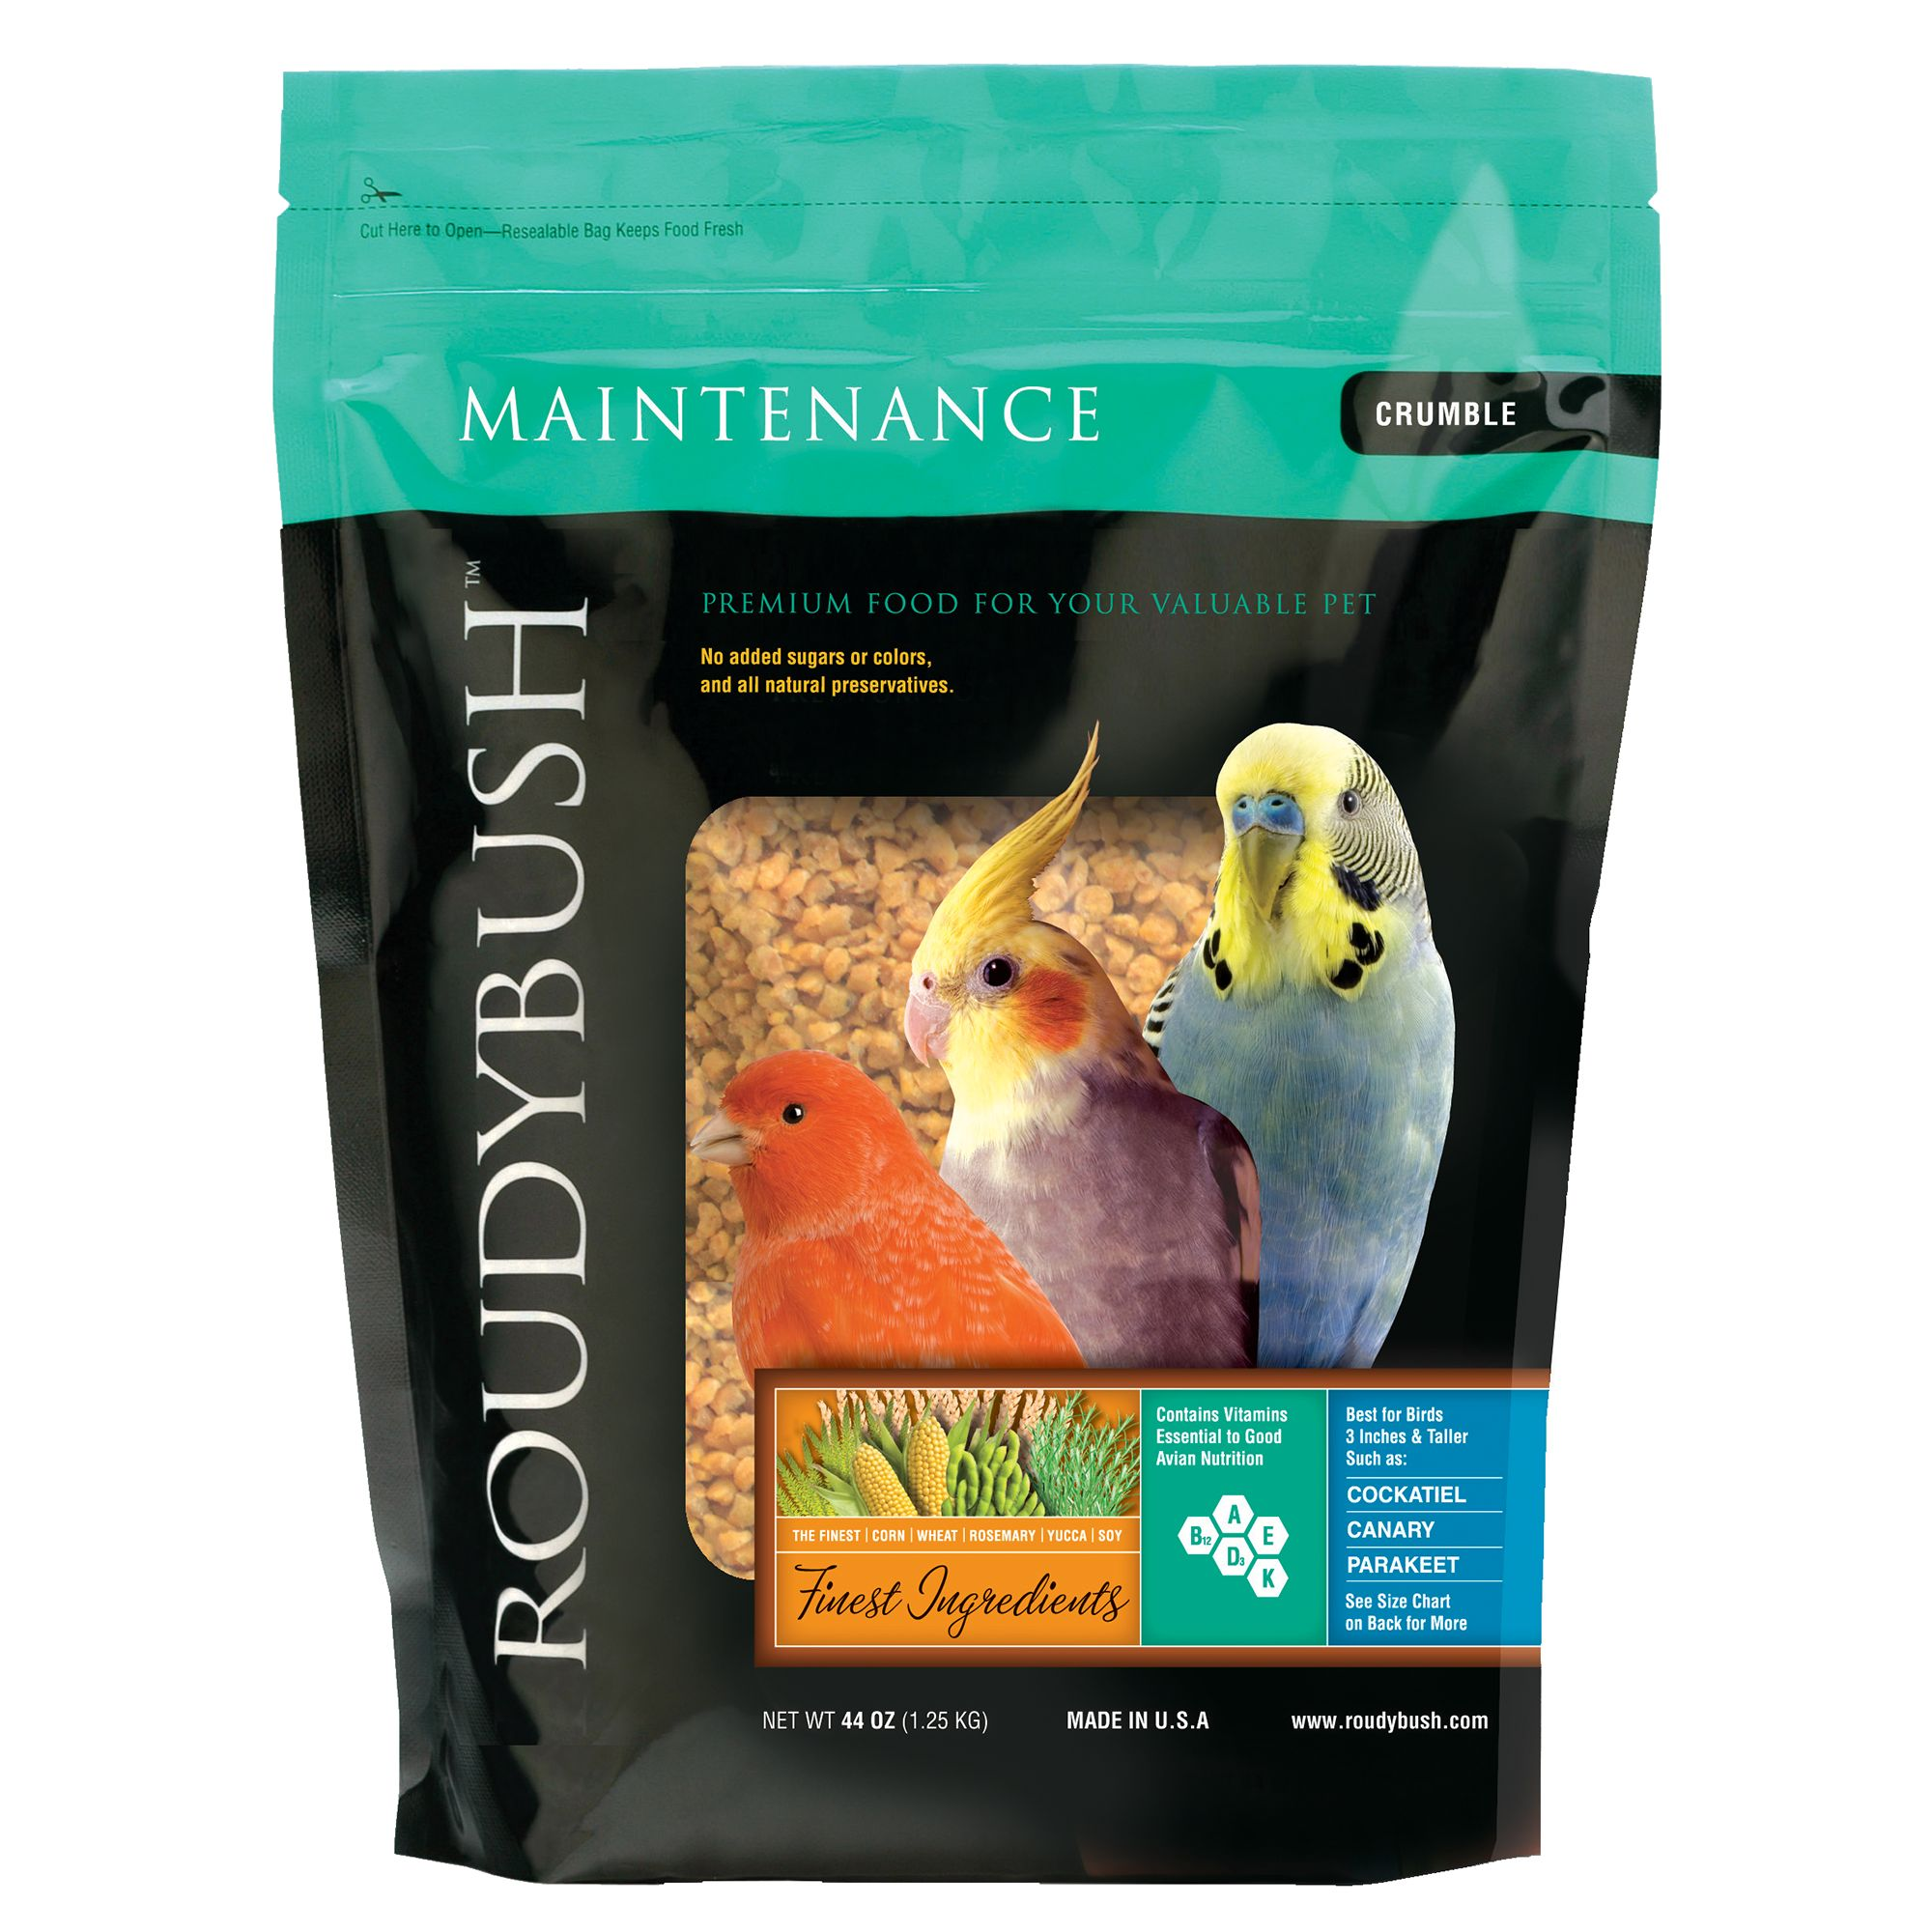 Roudybush Maintenance Crumble Bird Food Size 44 Oz